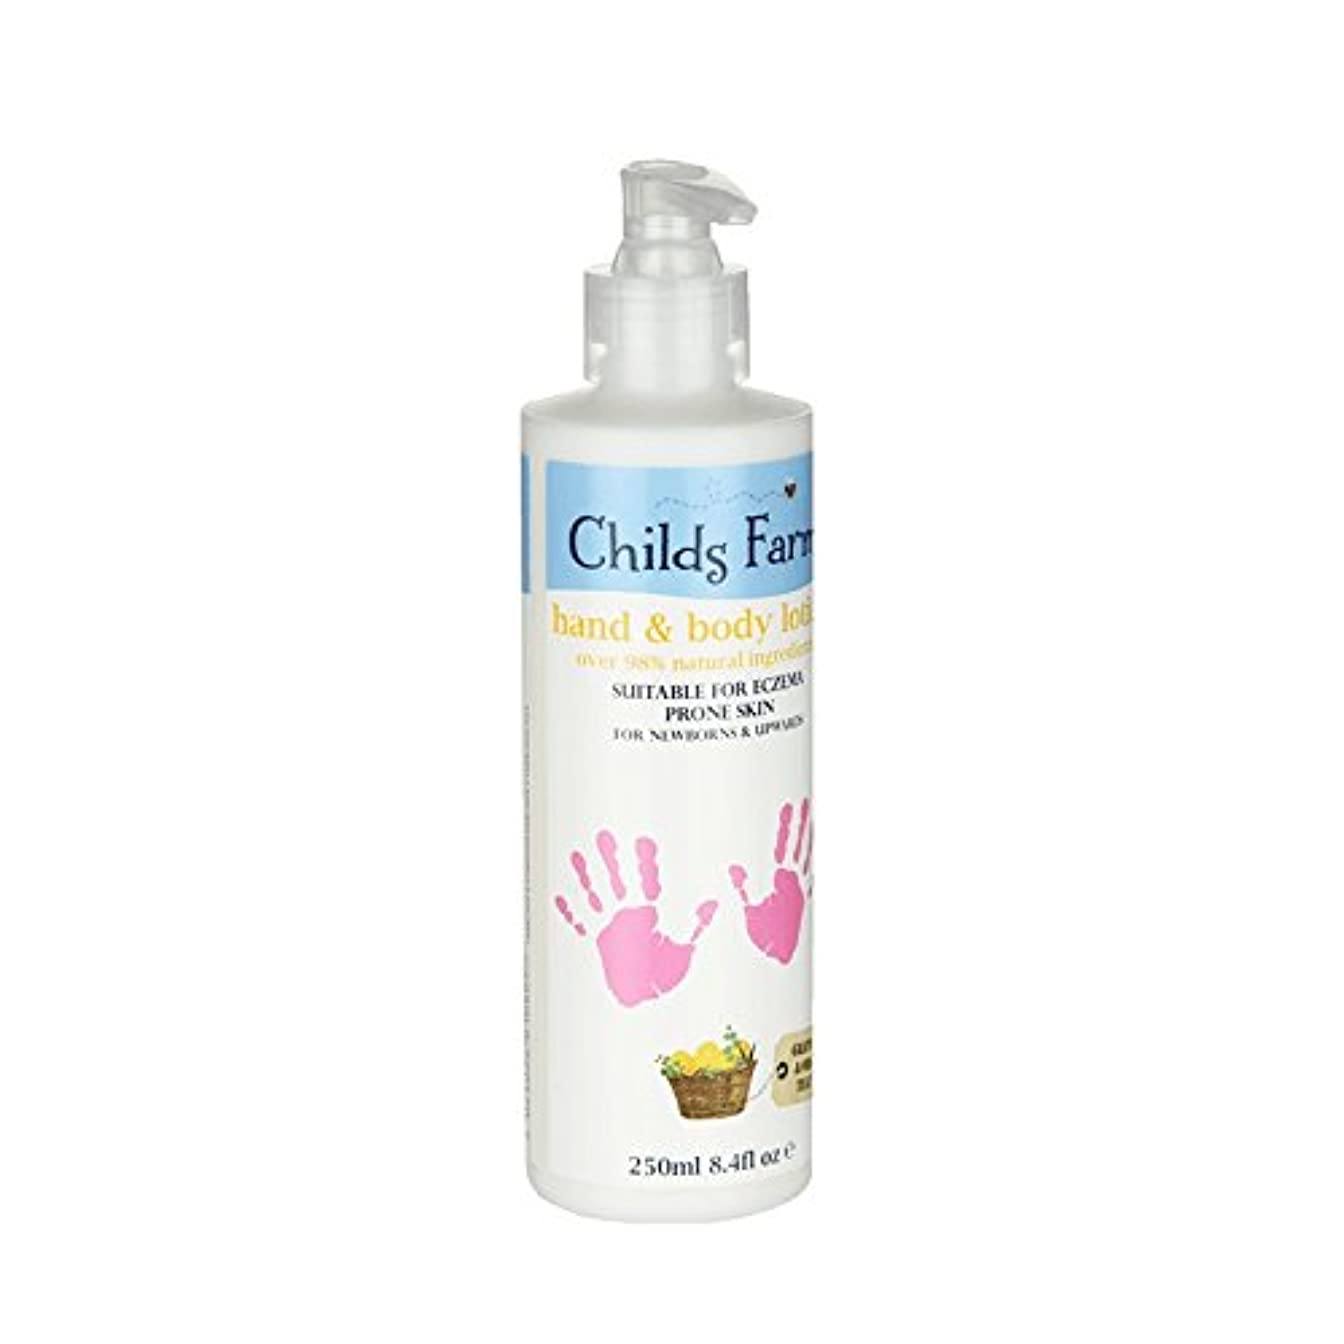 Childs Farm Hand & Body Lotion for Silky Skin 250ml (Pack of 6) - 絹のような肌の250ミリリットルのためのチャイルズファームハンド&ボディローション (x6...